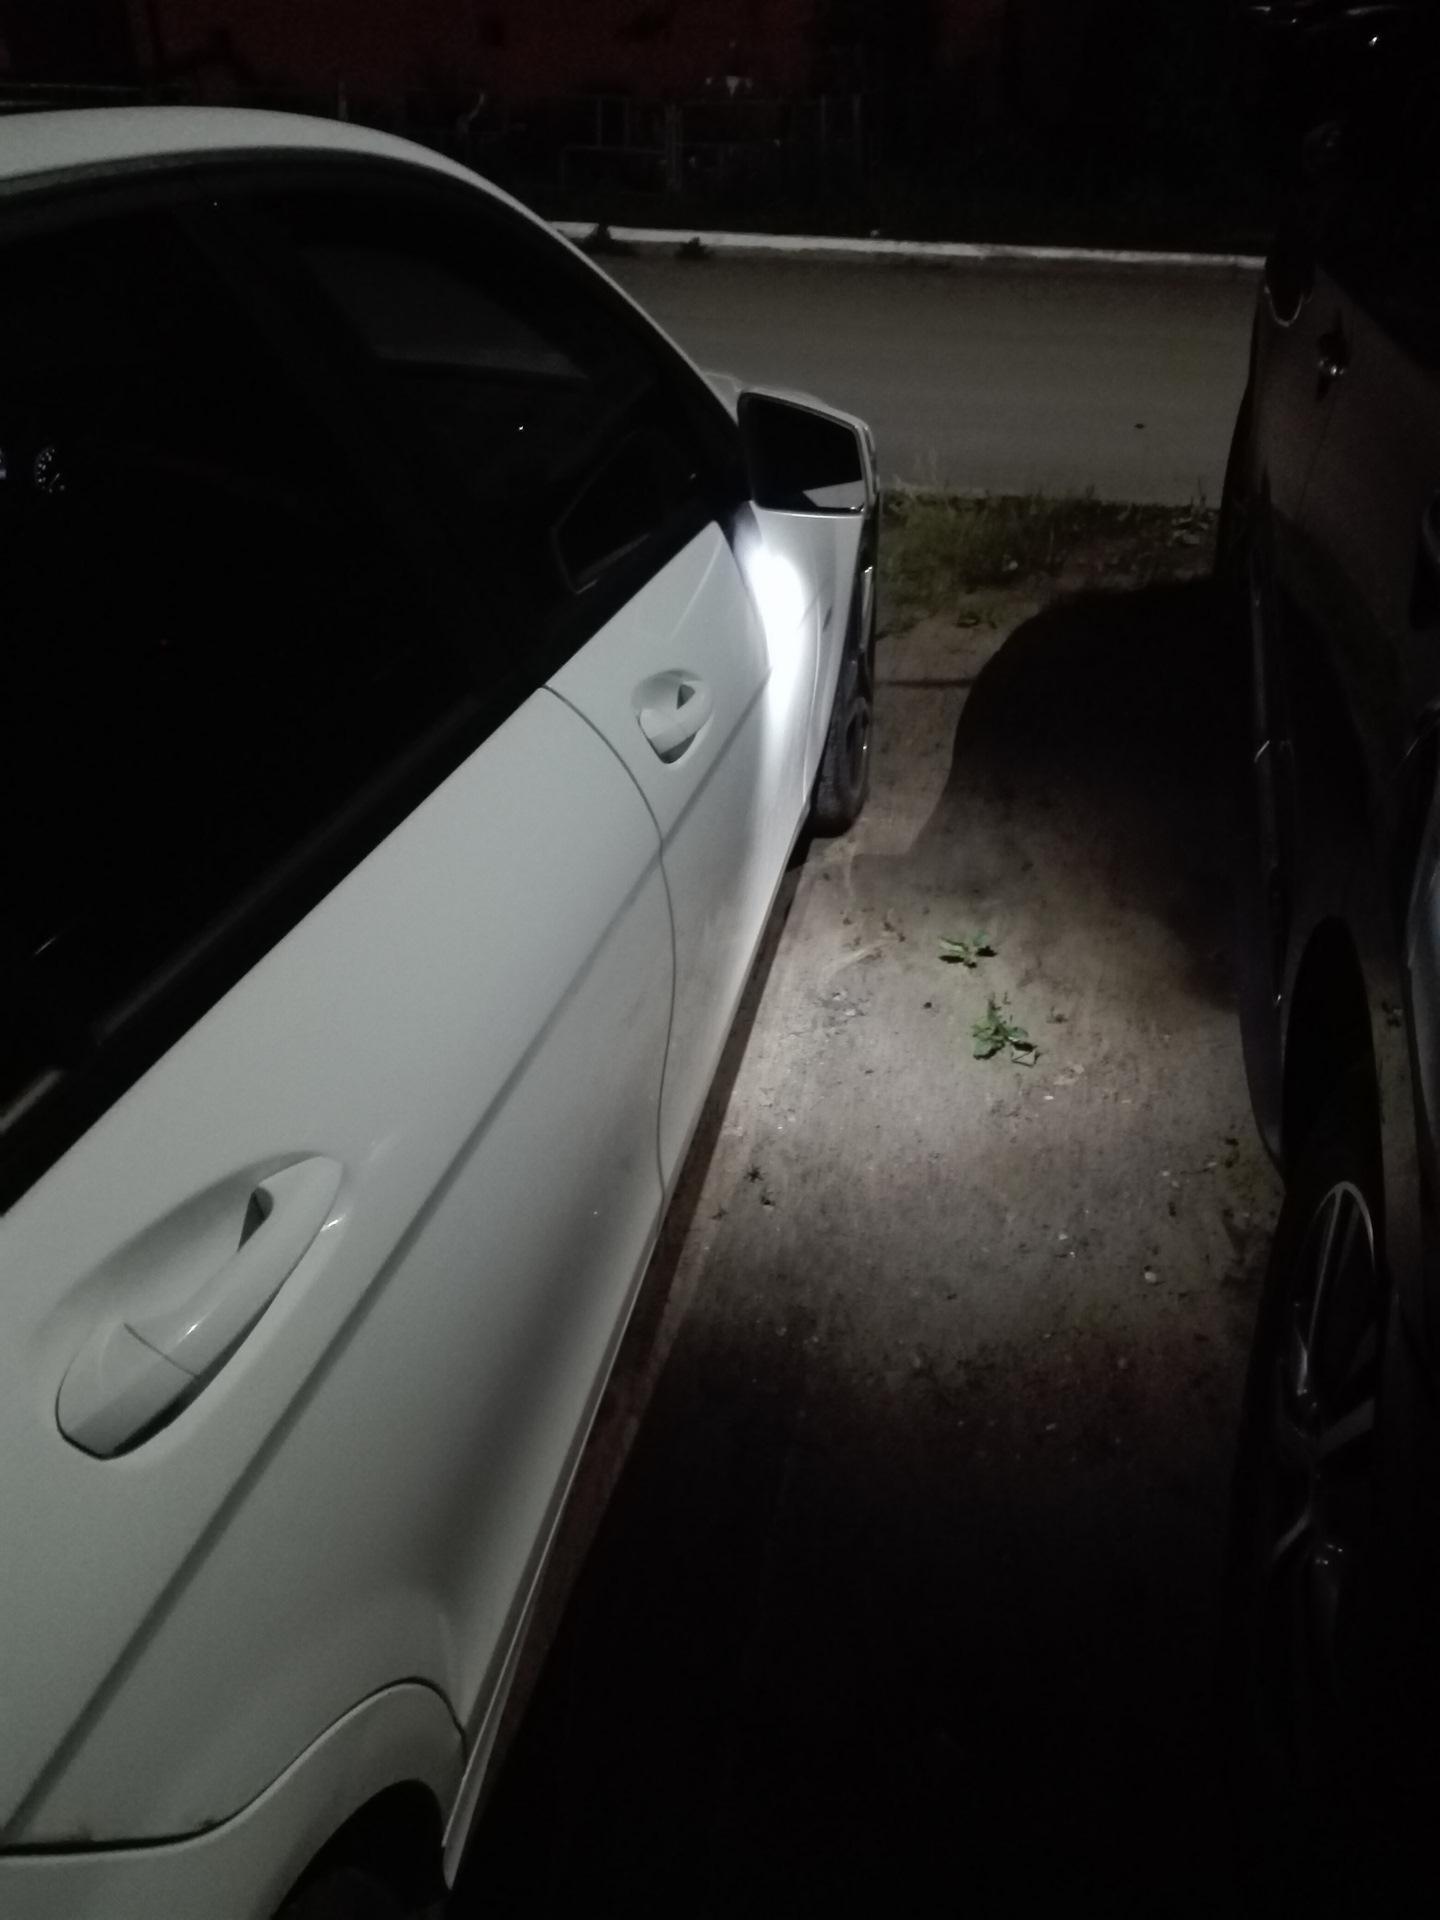 Подсветка зеркал + Launch кодирование — Mercedes-Benz C-class, 1 6 л